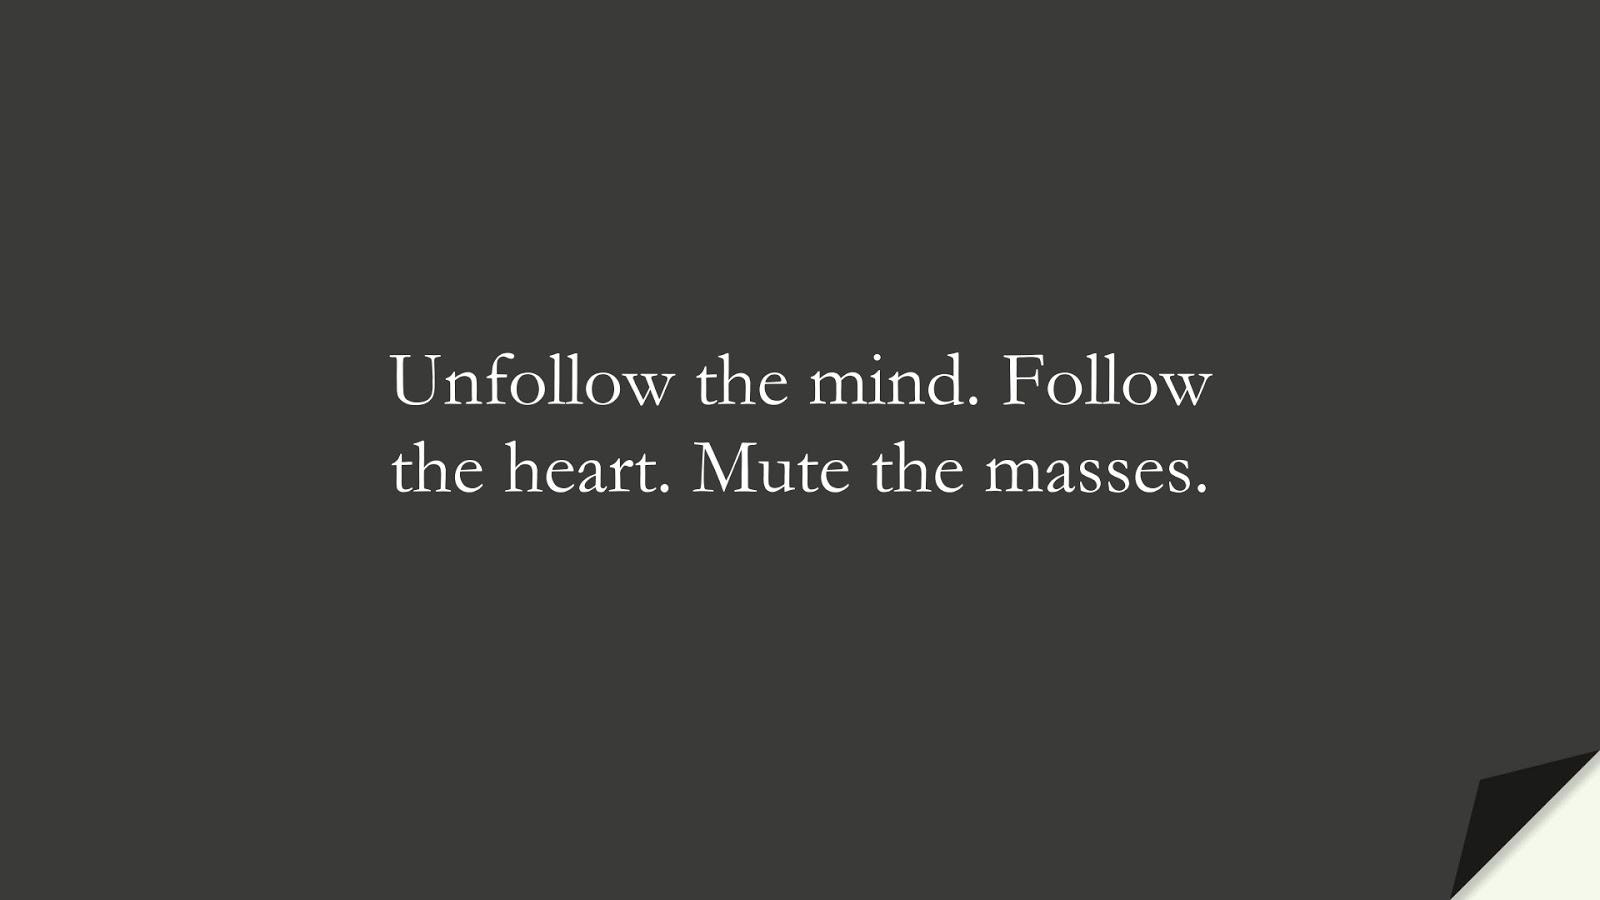 Unfollow the mind. Follow the heart. Mute the masses.FALSE